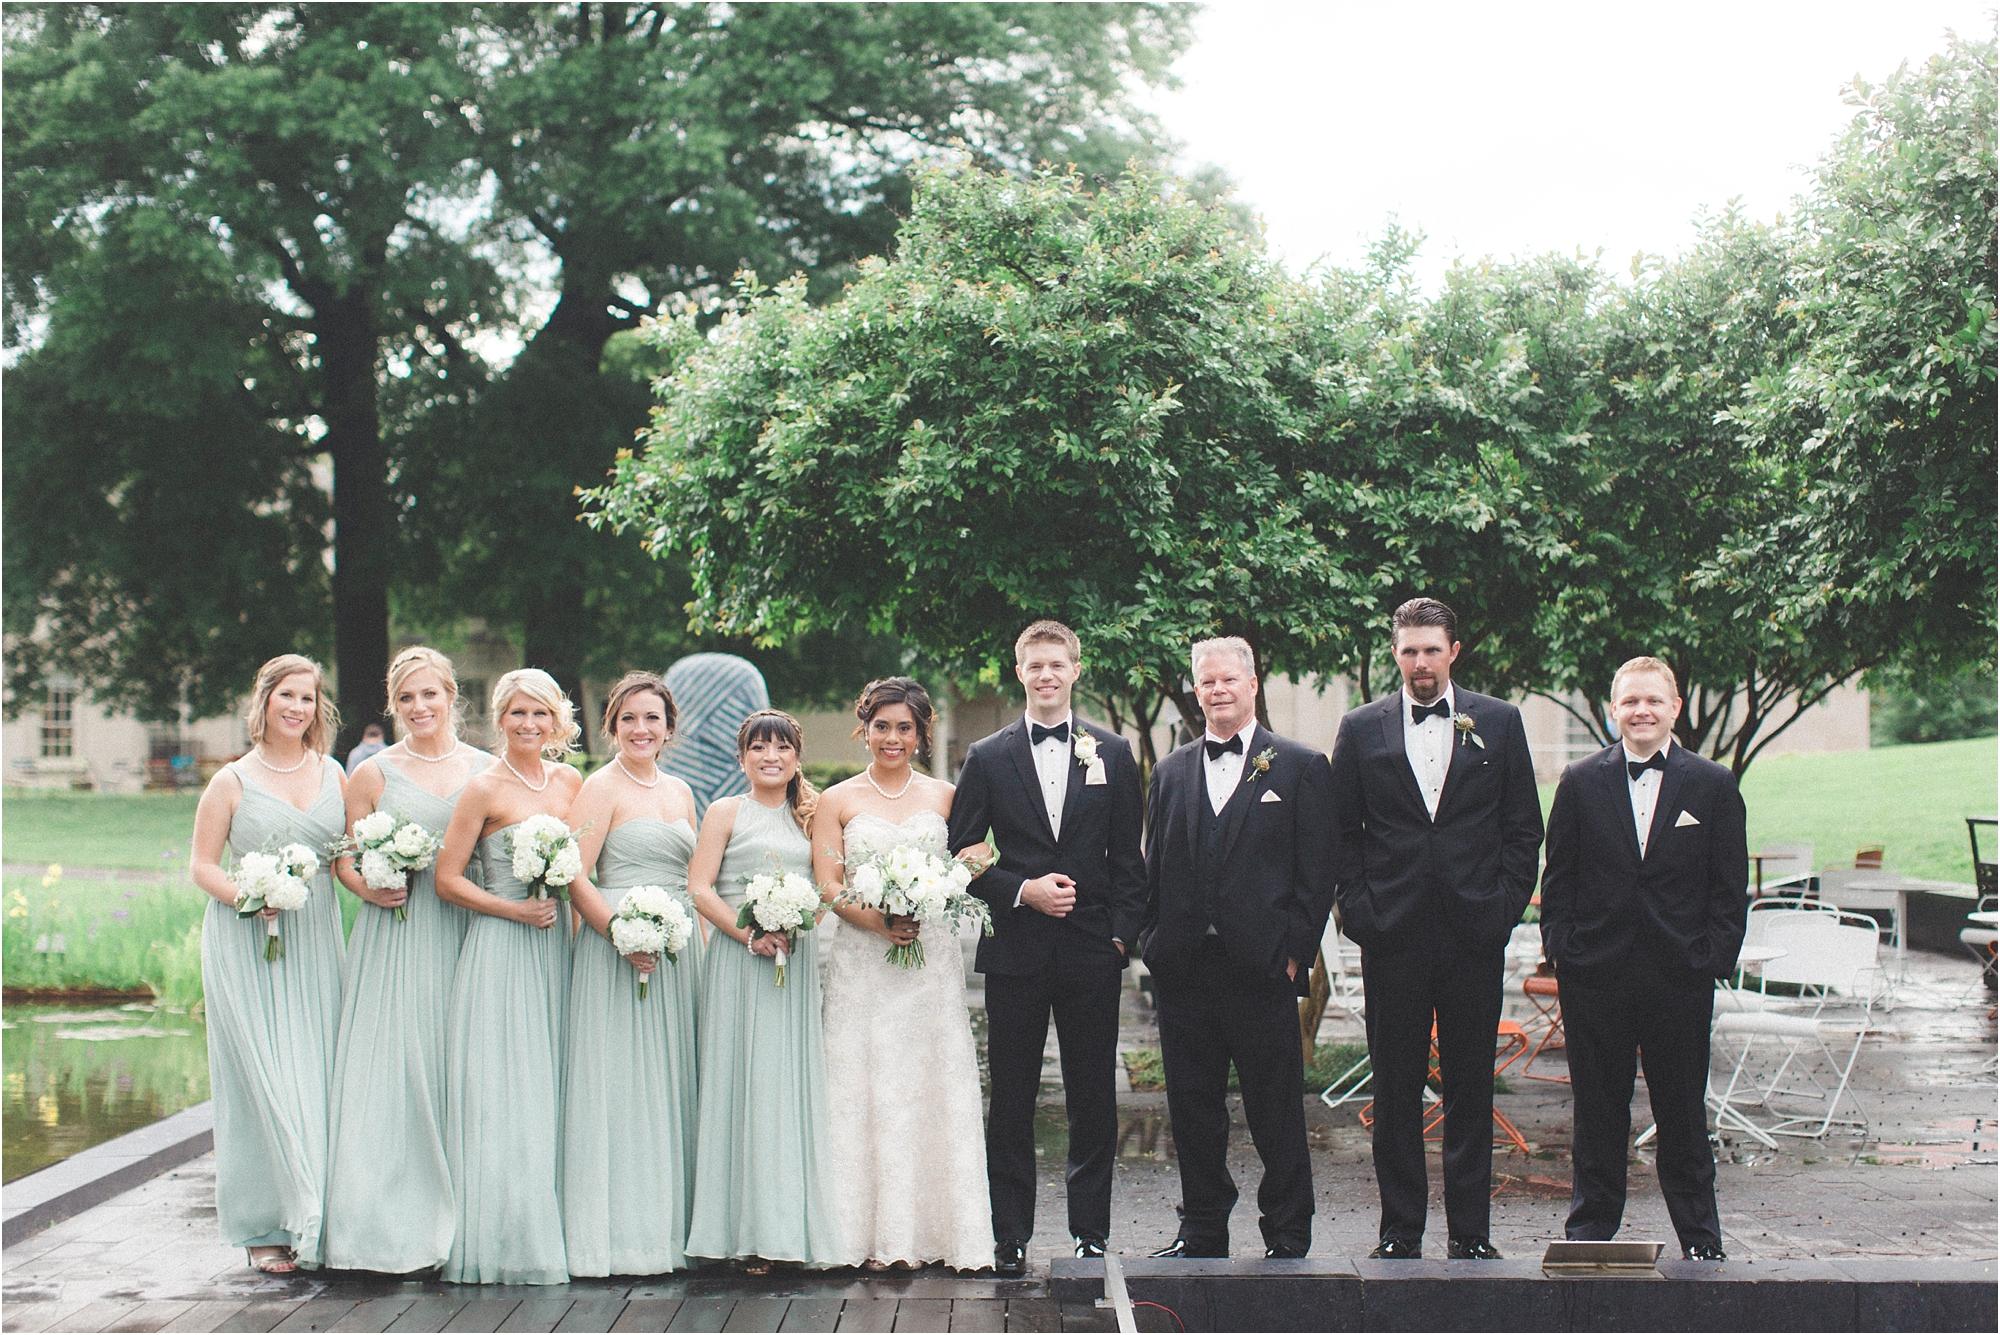 stephanie-yonce-photography-historic-church-virginia-museu-fine-arts-wedding-photos_052.JPG